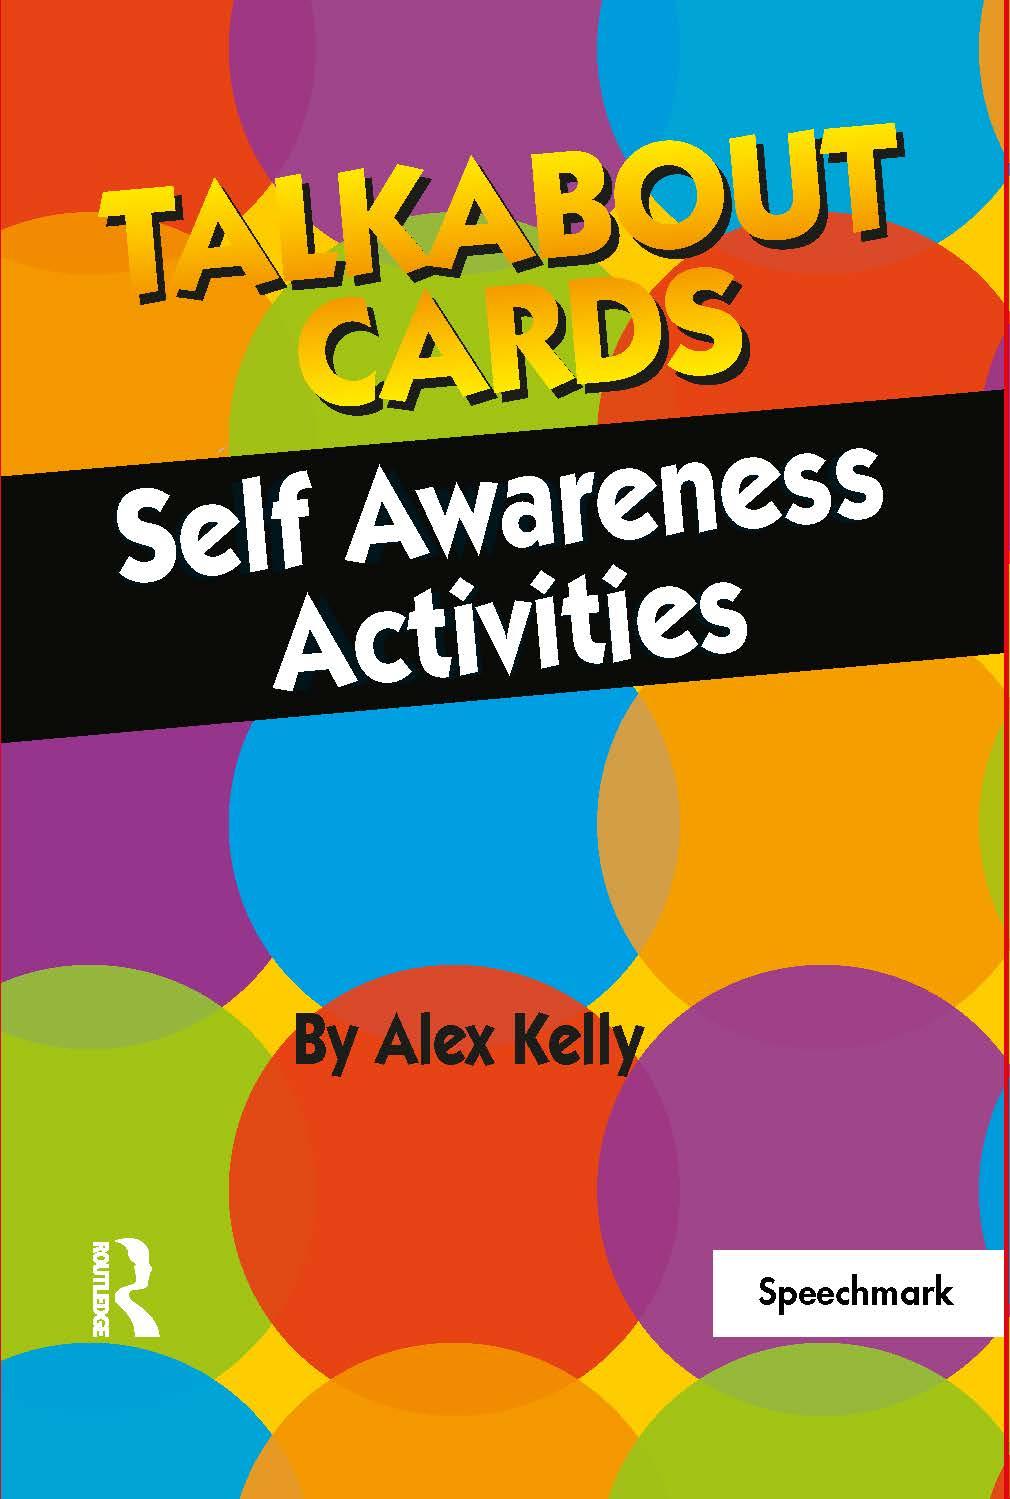 Talkabout Cards - Self Awareness Game: Self Awareness Activities, 1st Edition (Flashcards) book cover